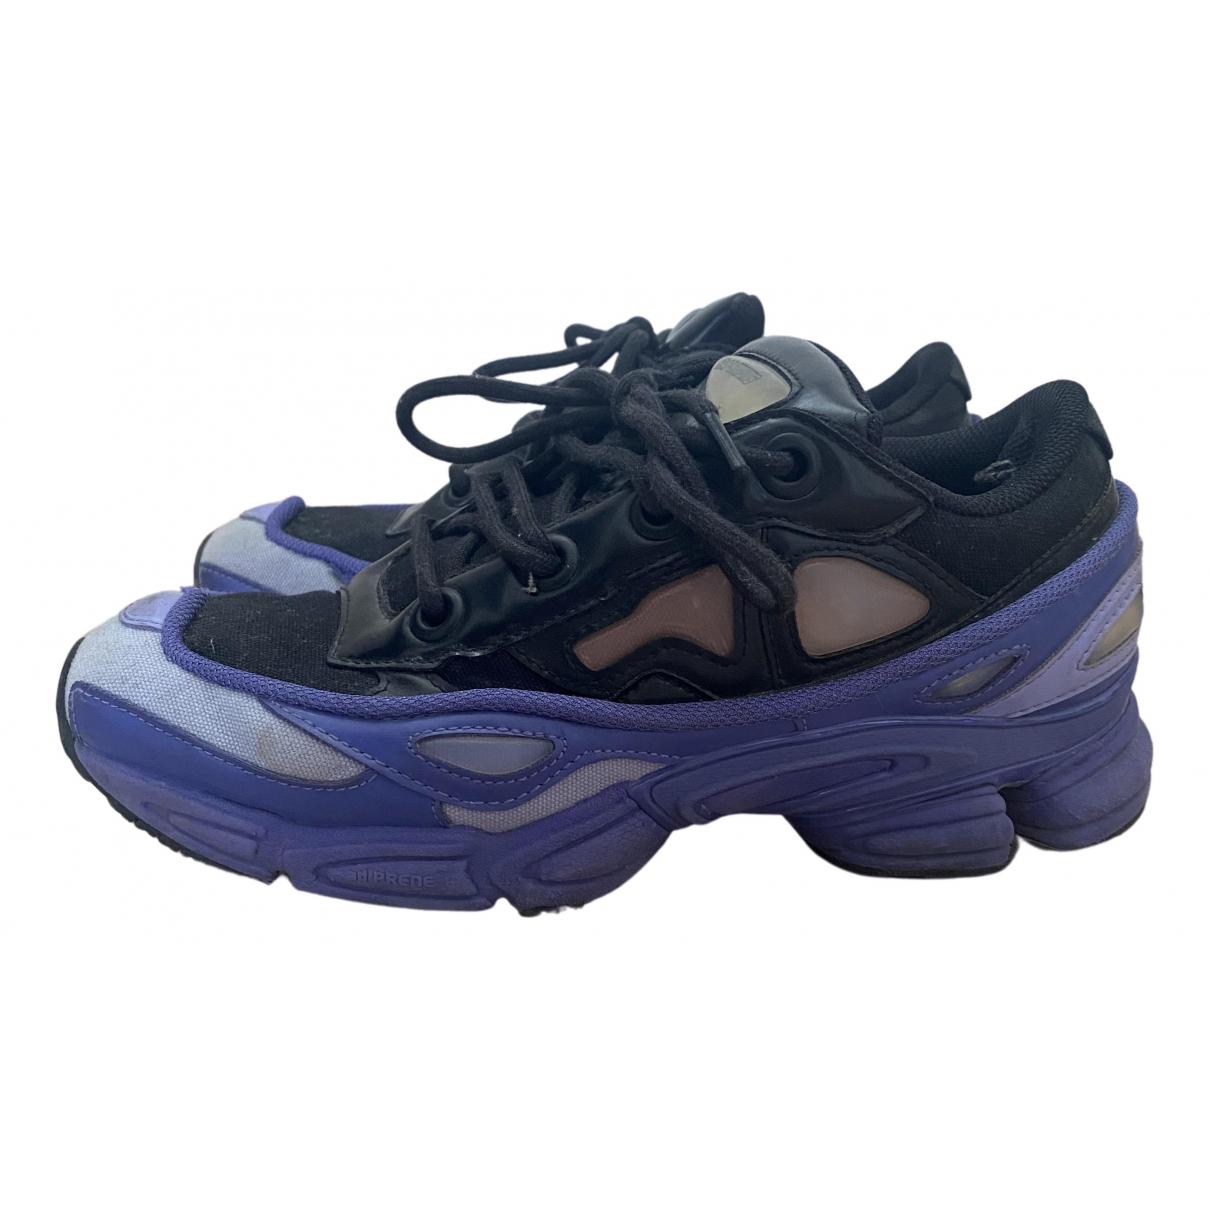 Adidas X Raf Simons RS Ozweego Purple Cloth Trainers for Women 6 UK